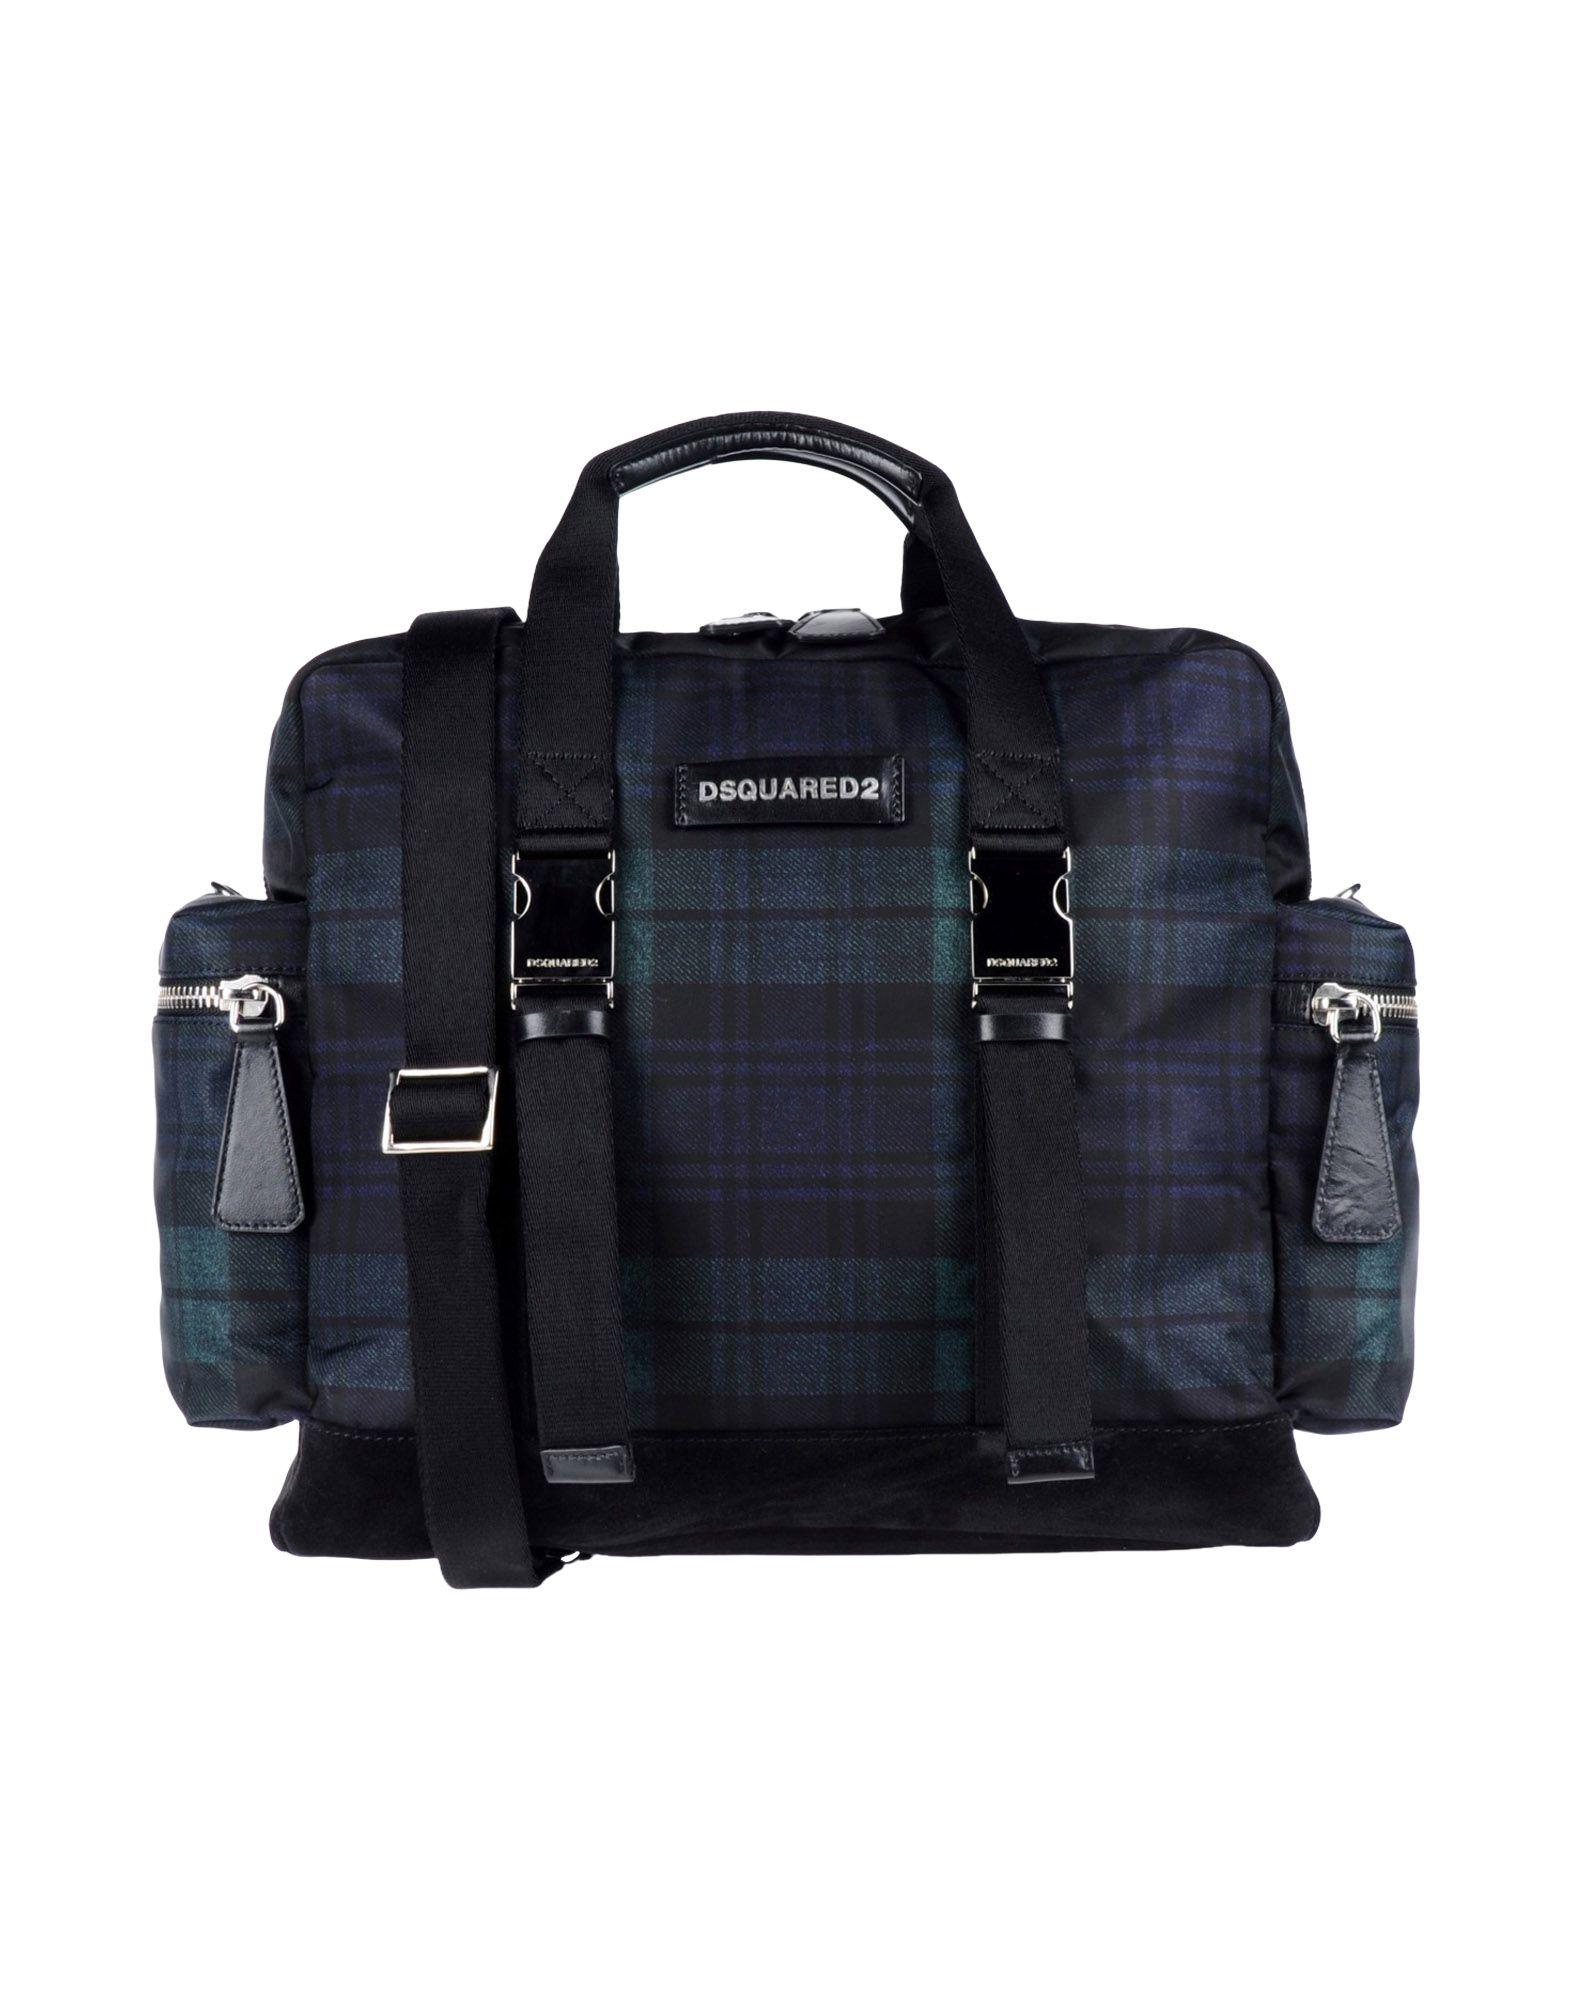 DSQUARED2 Деловые сумки сумка frija сумки деловые